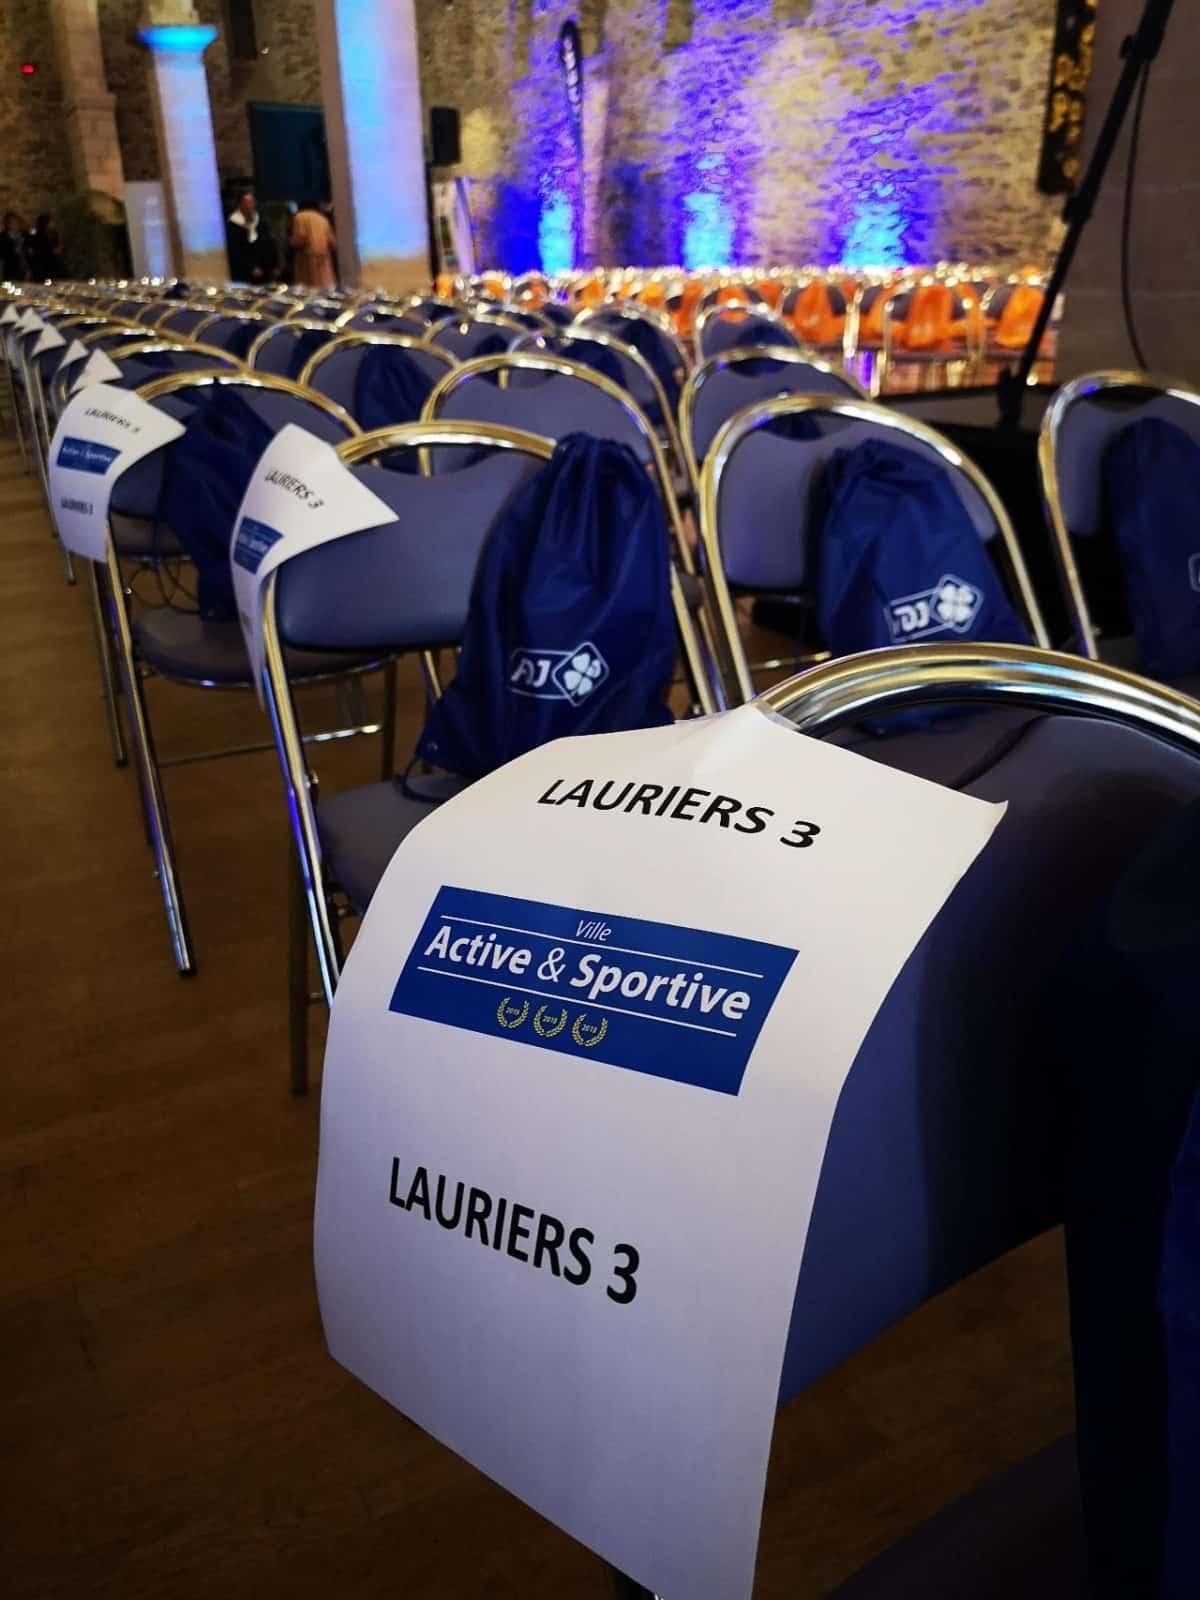 Lauriers-ville-active-sportive